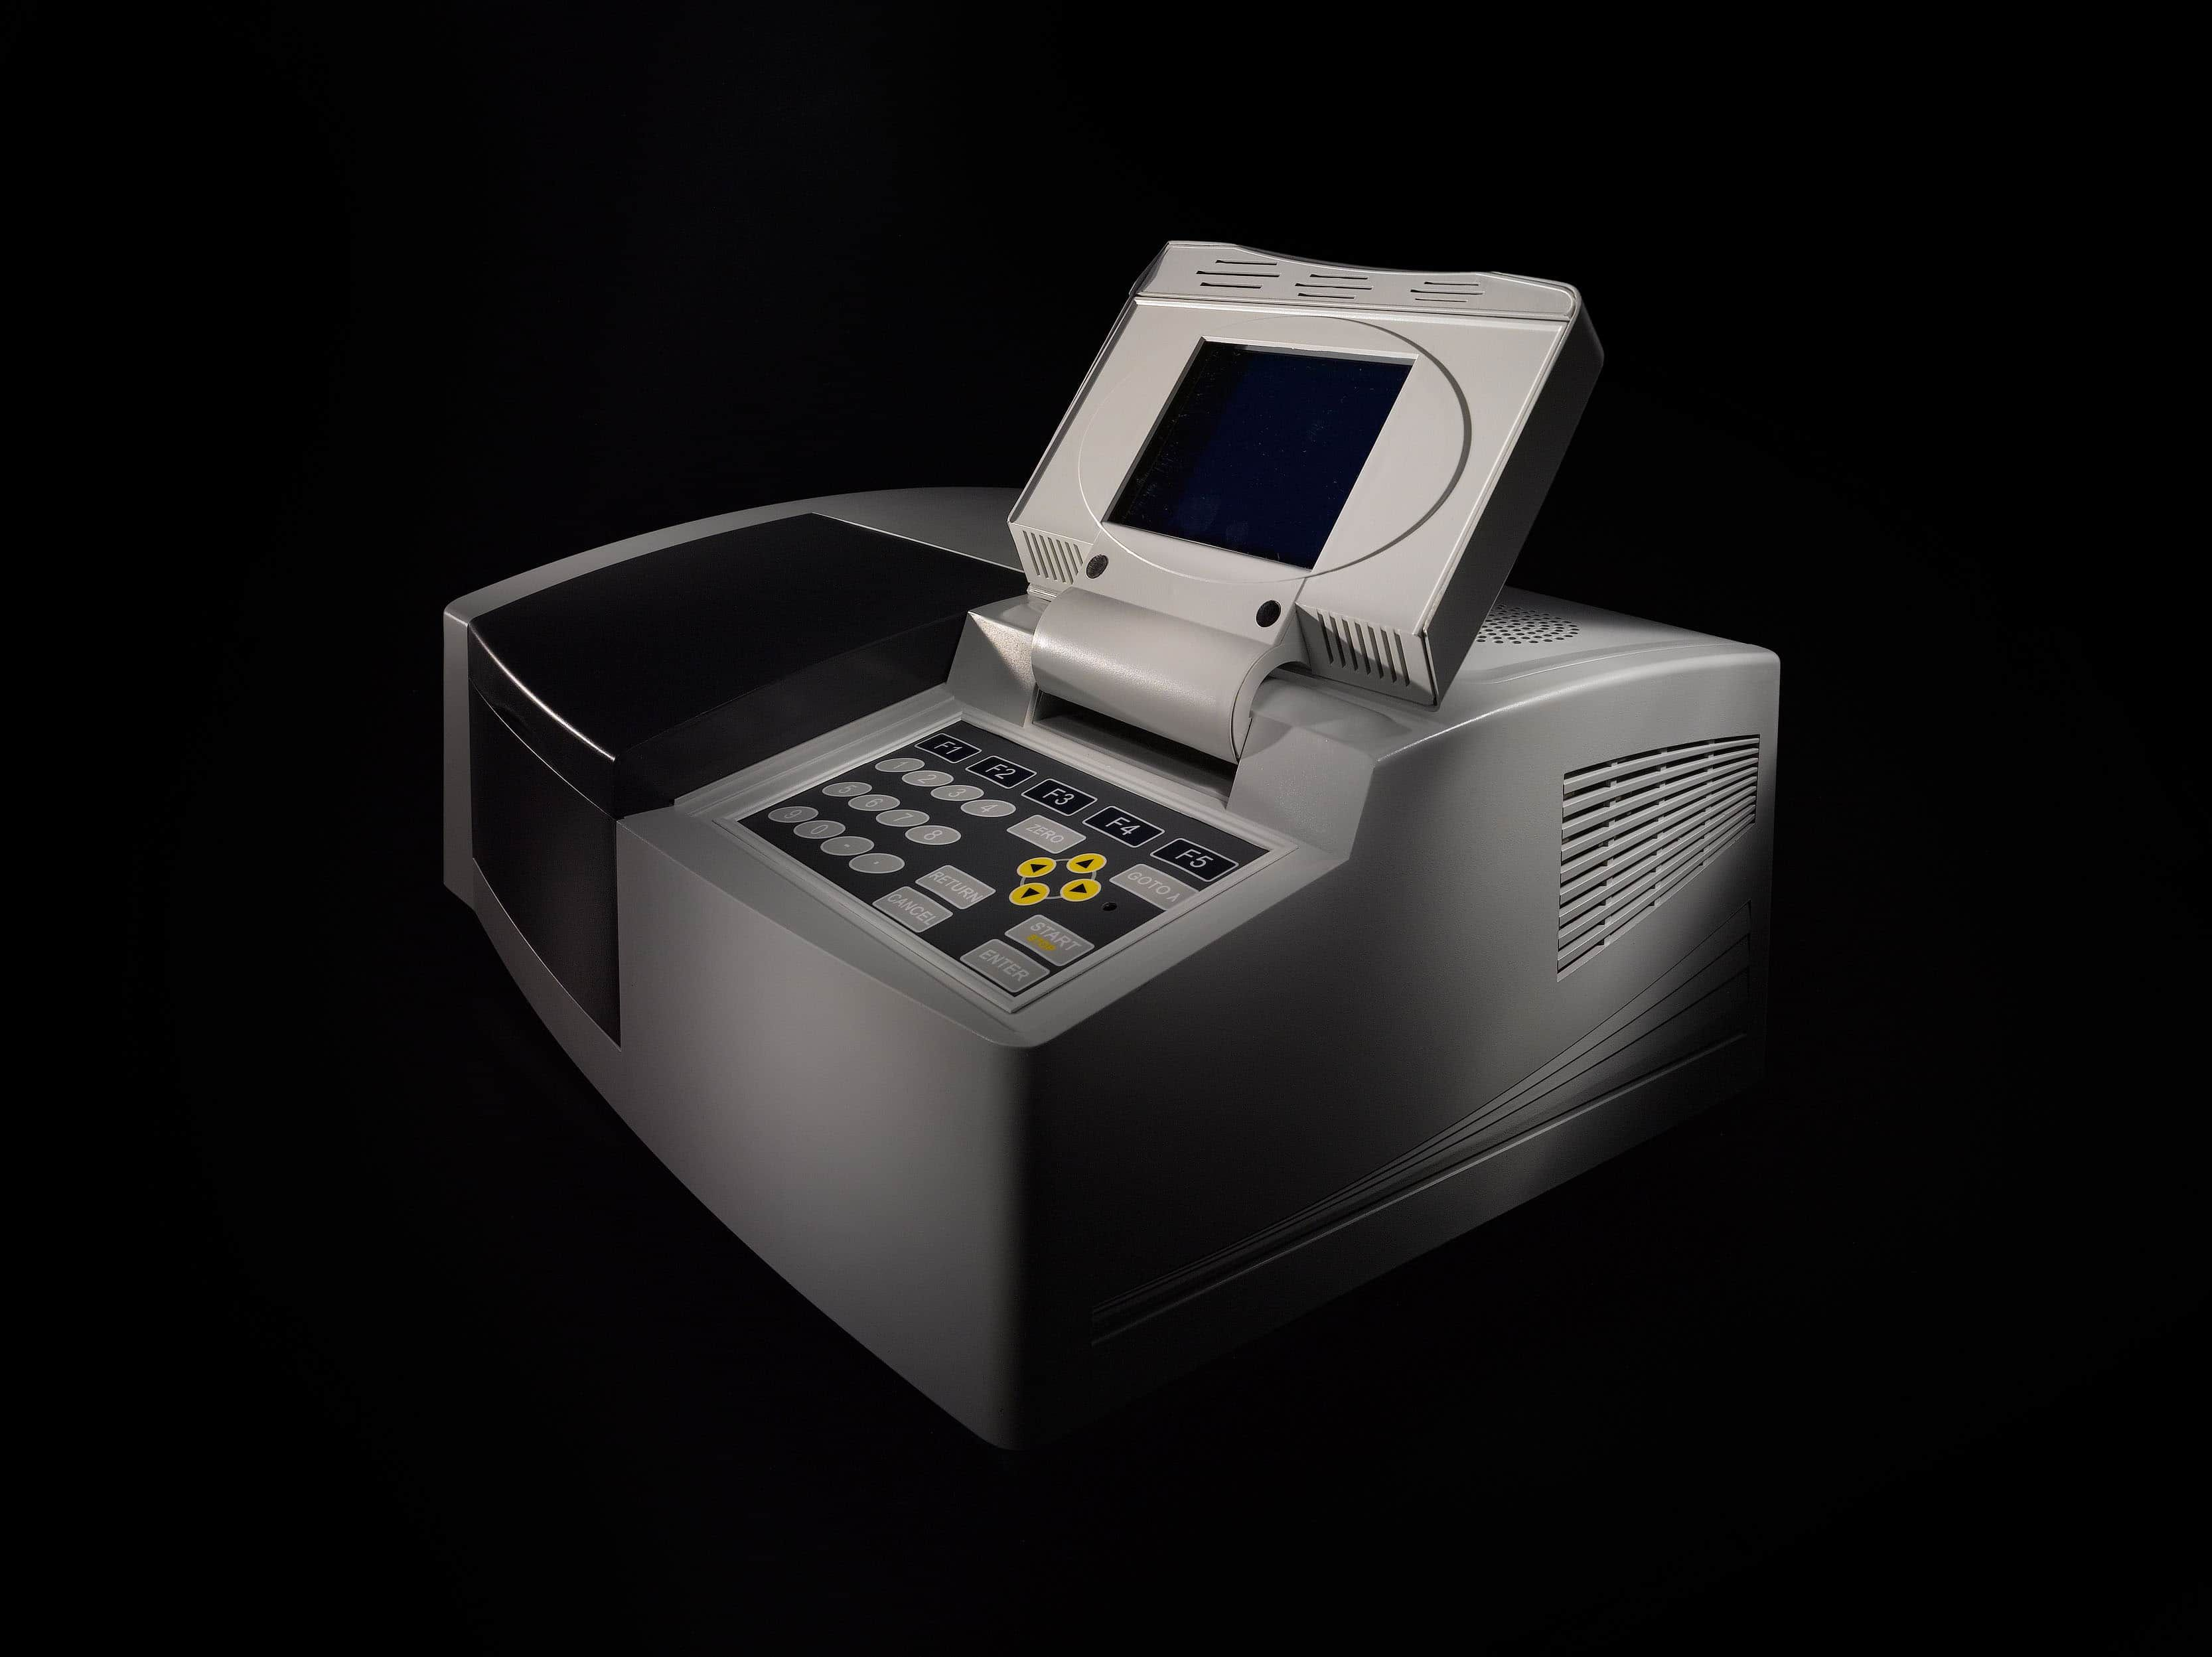 Brand New PERSEE T7S UV-Vis Spectrometer